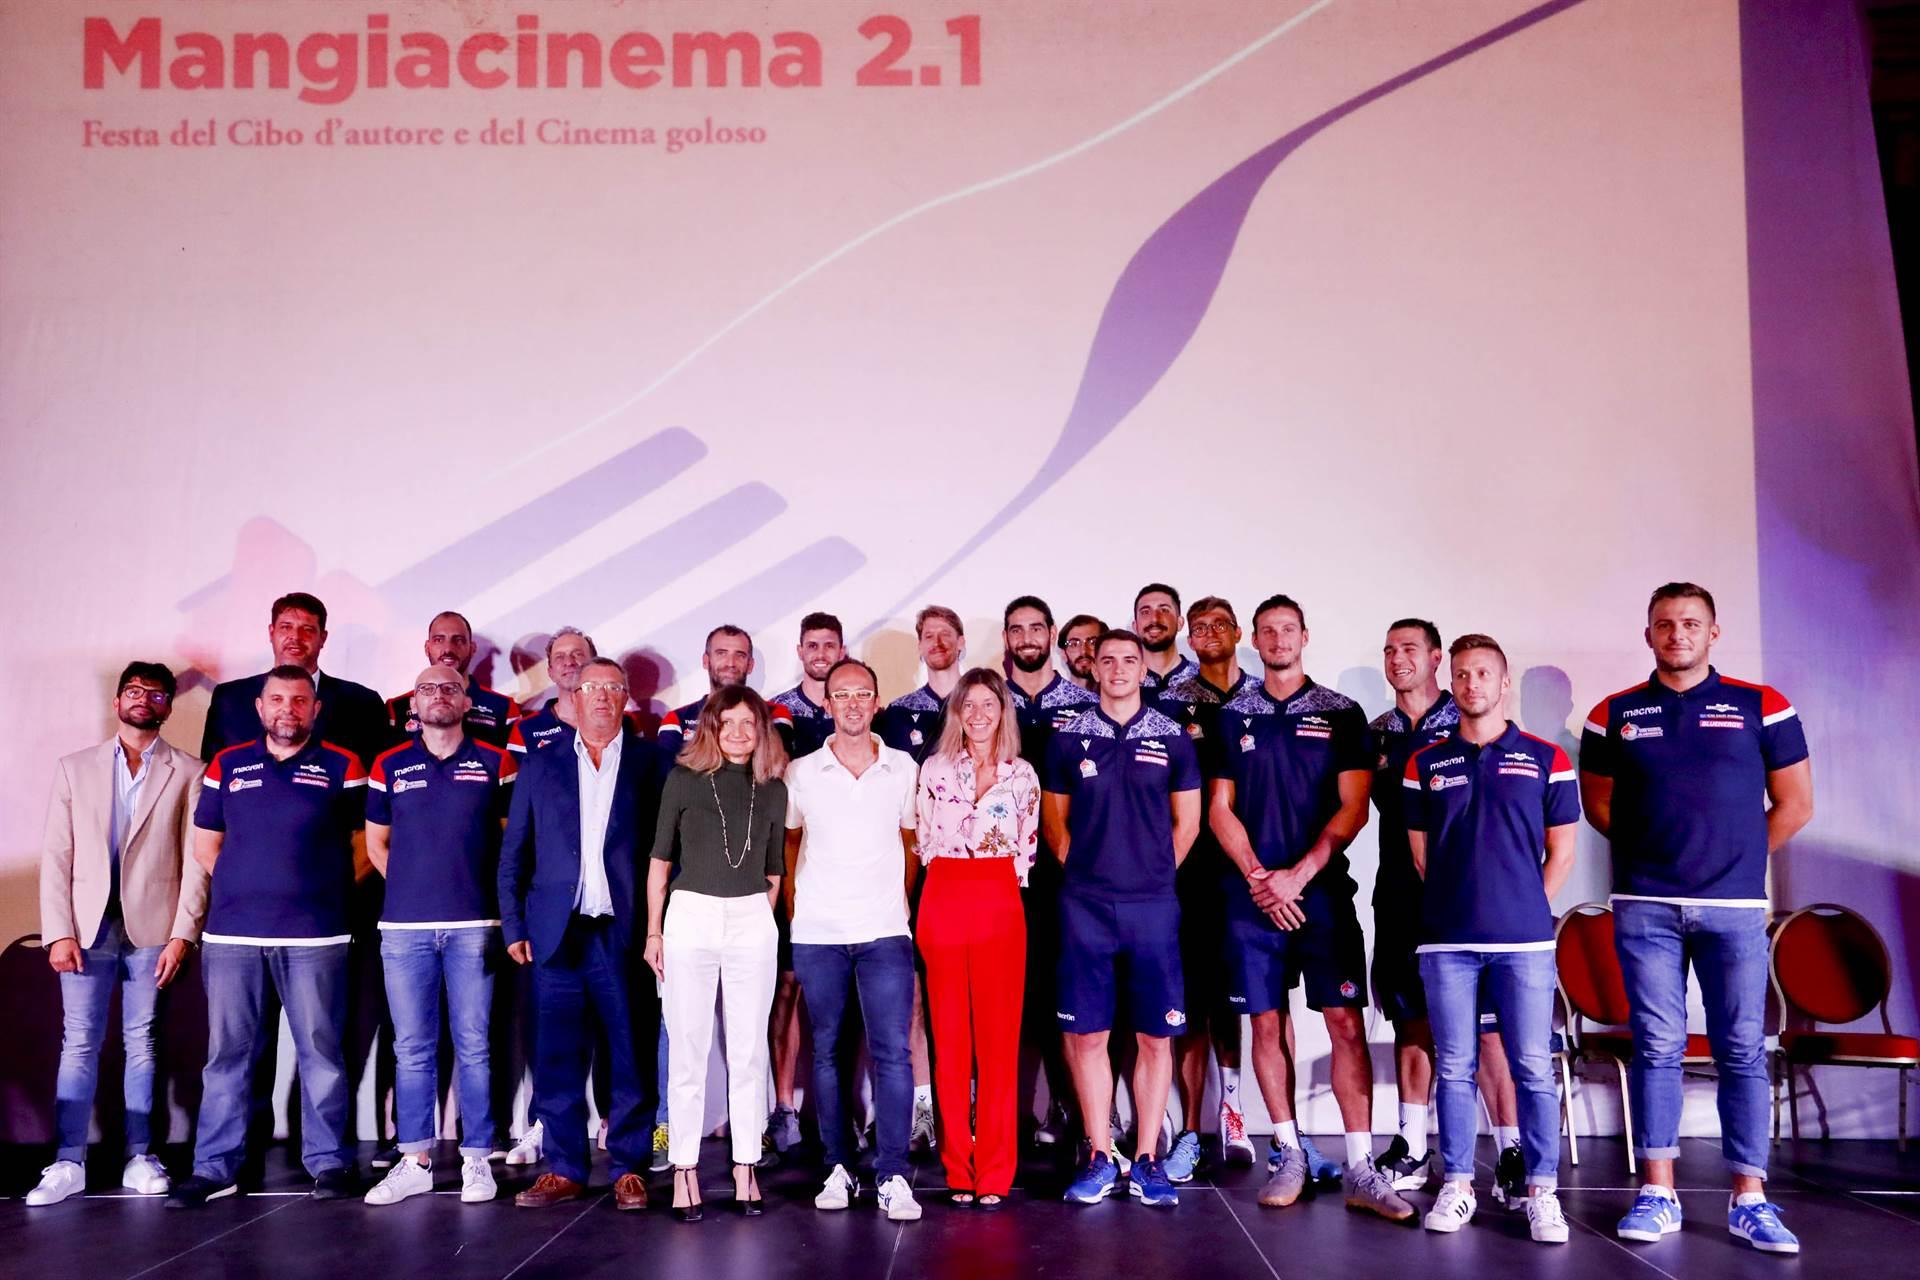 Trasferta Salsese per Gas Sales Bluenergy Volley Piacenza ospite a Mangiacinema 2.1 image